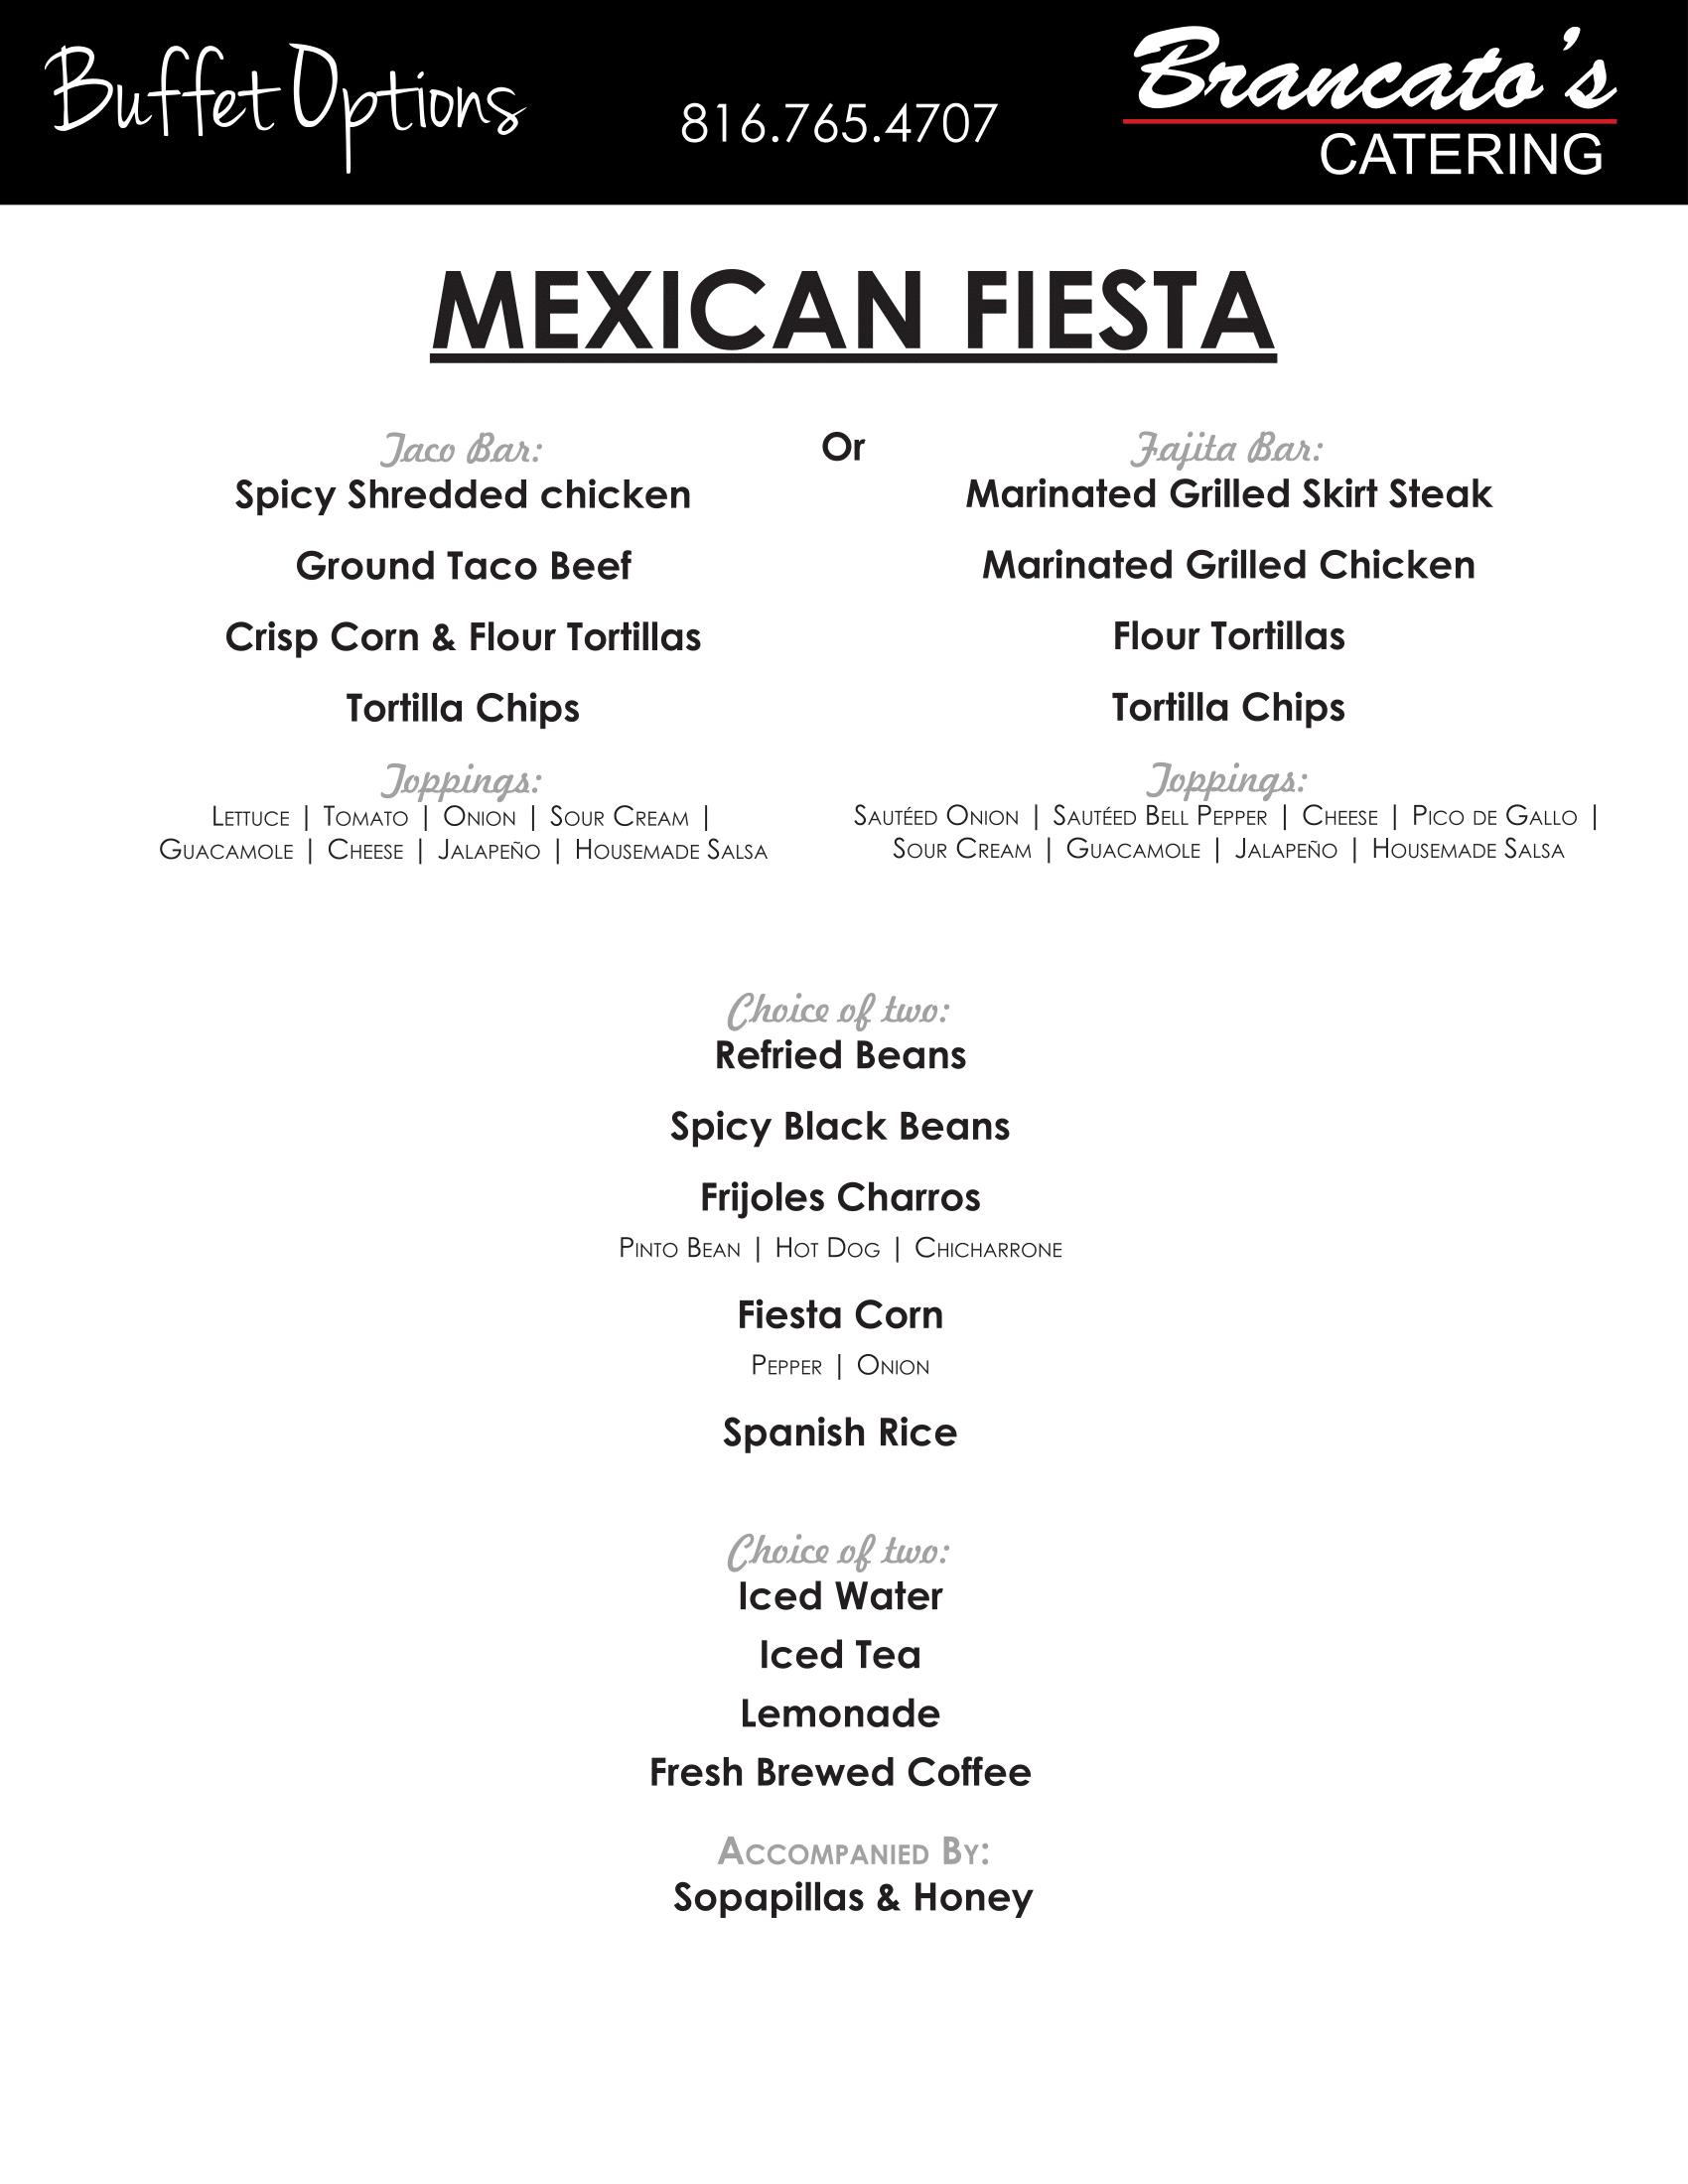 mexican fiesta-1